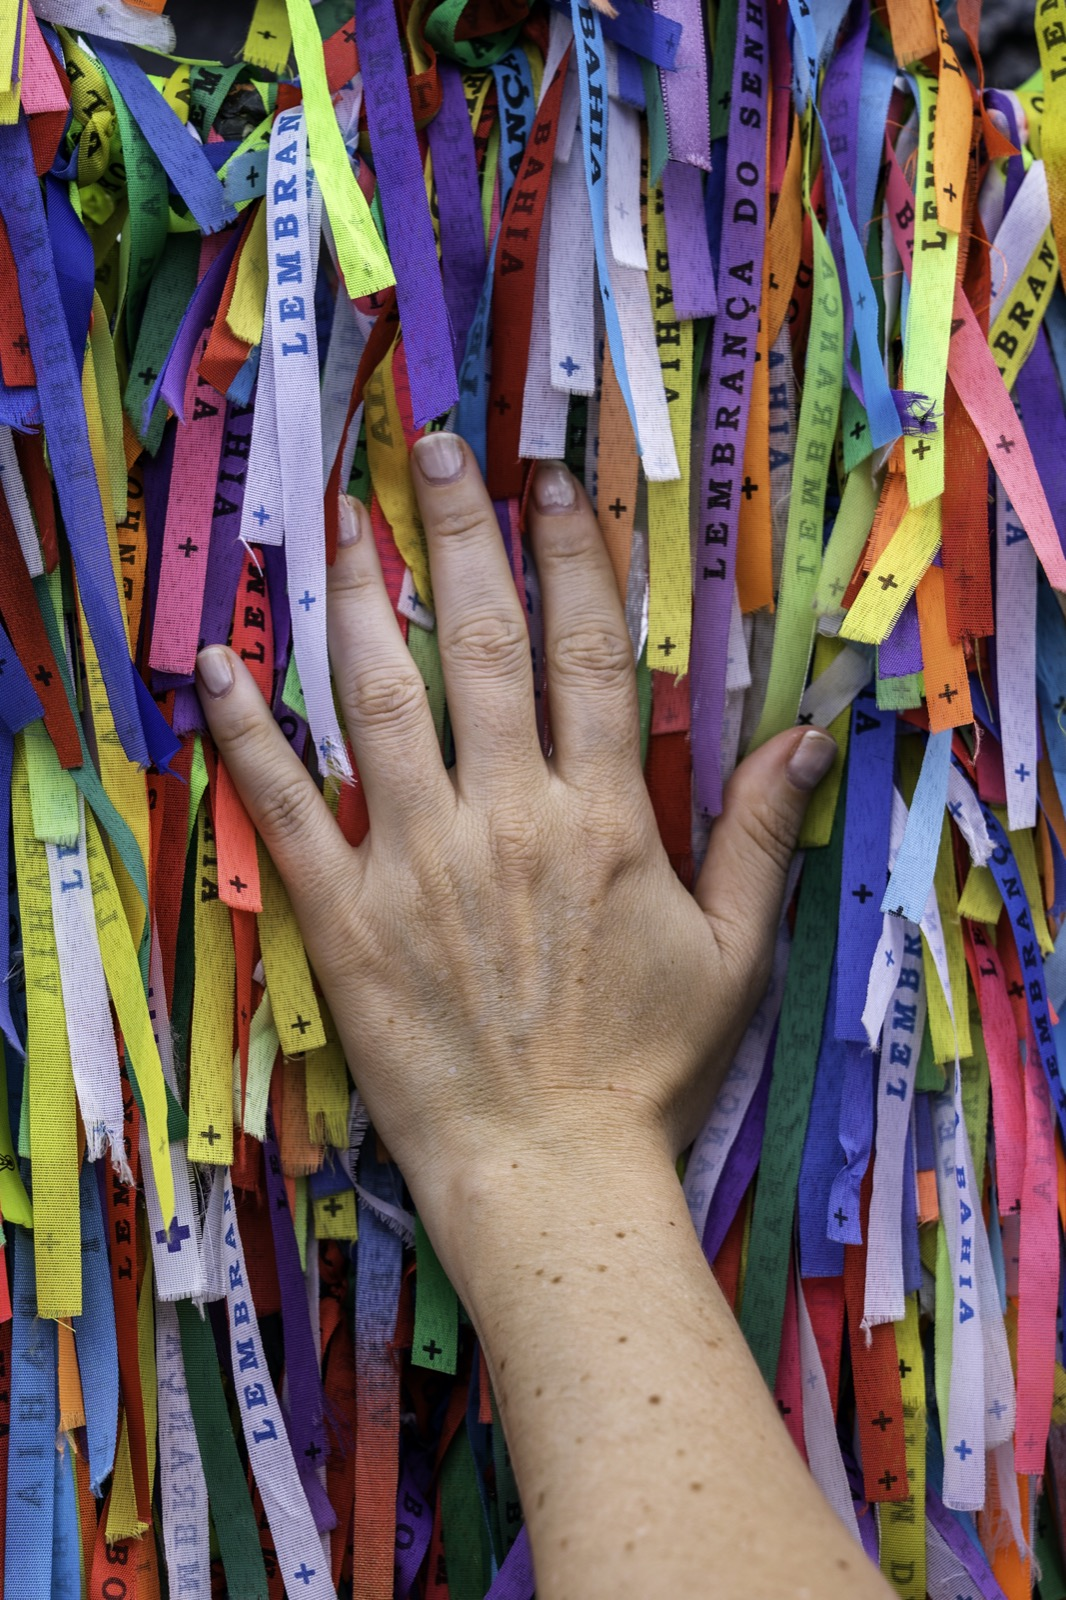 Hand placed on Brazilian wish bracelets in Salvador Brazil